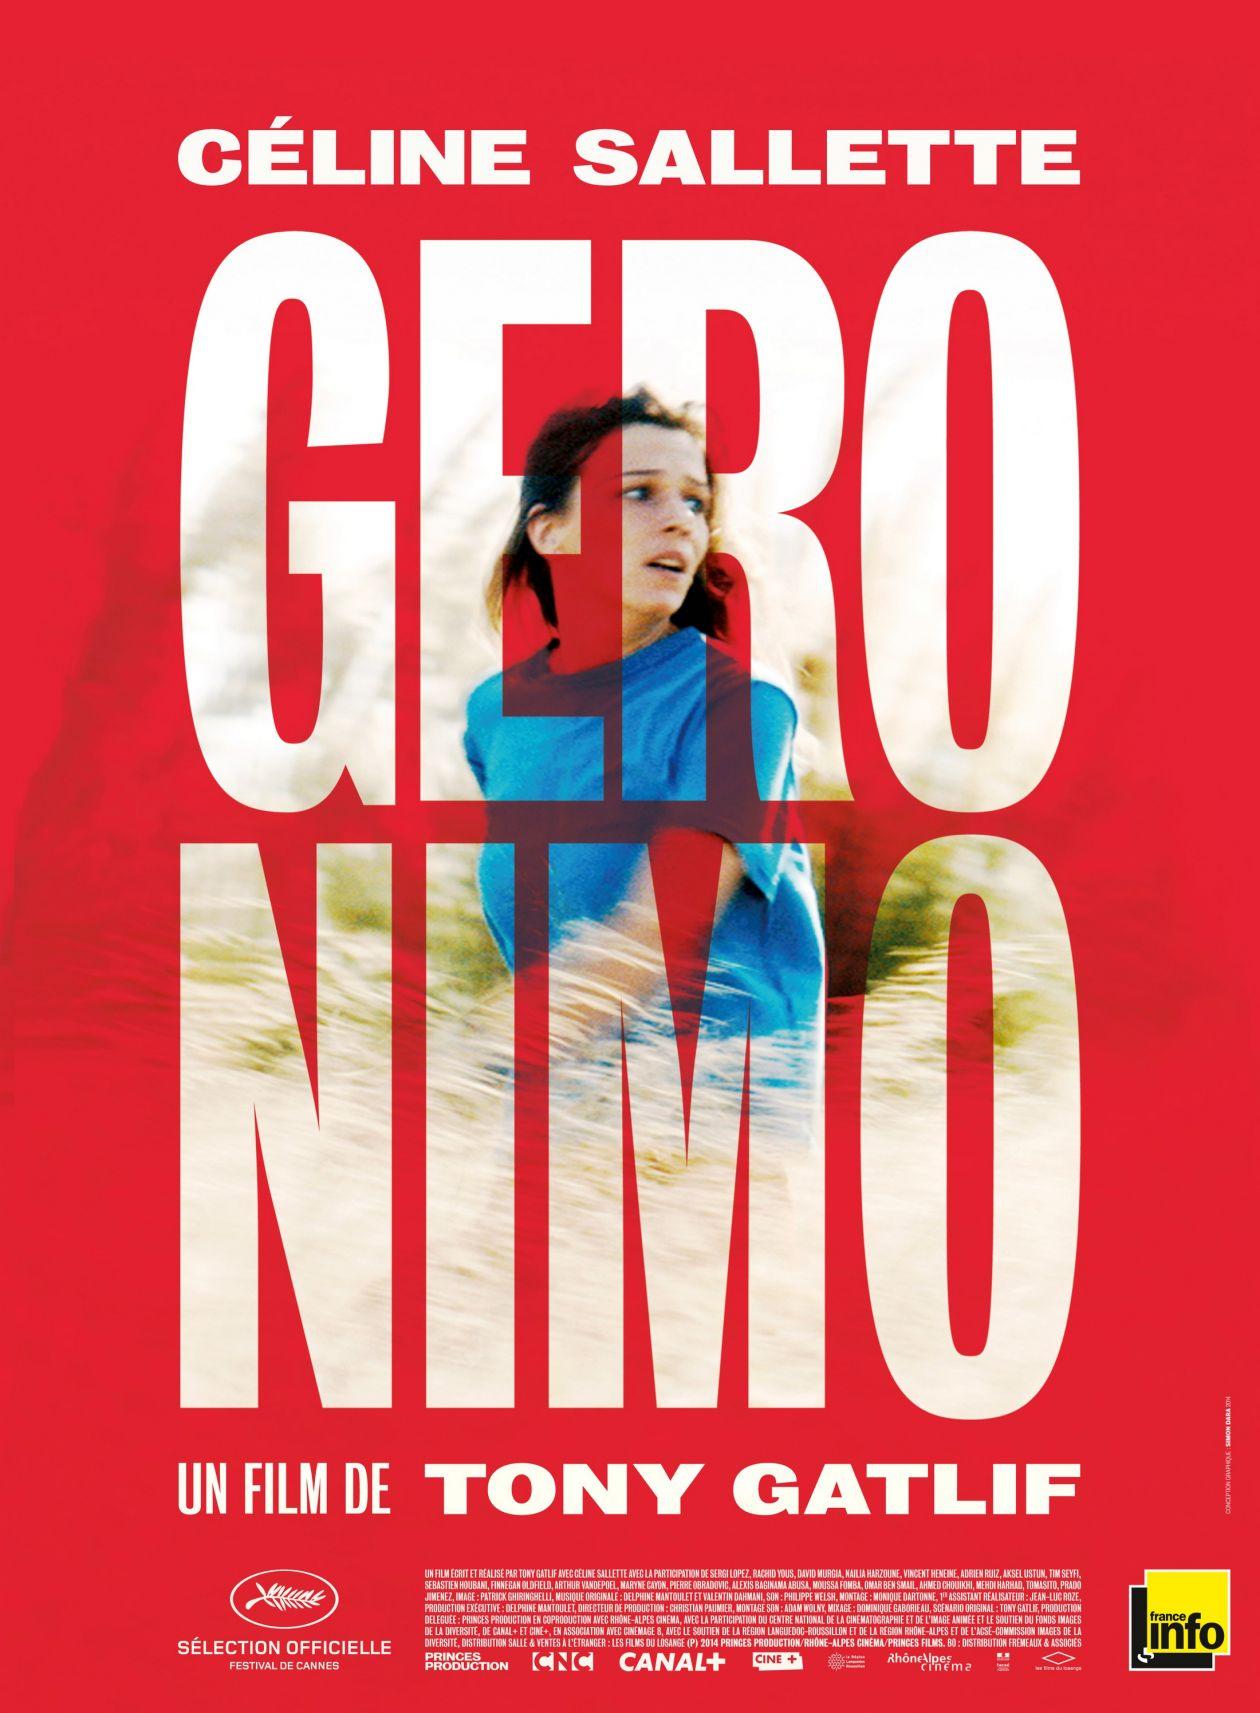 Céline Sallette French actress / GERONIMO / Tony Gatlif 2014 / Movie Poster / Affiche film